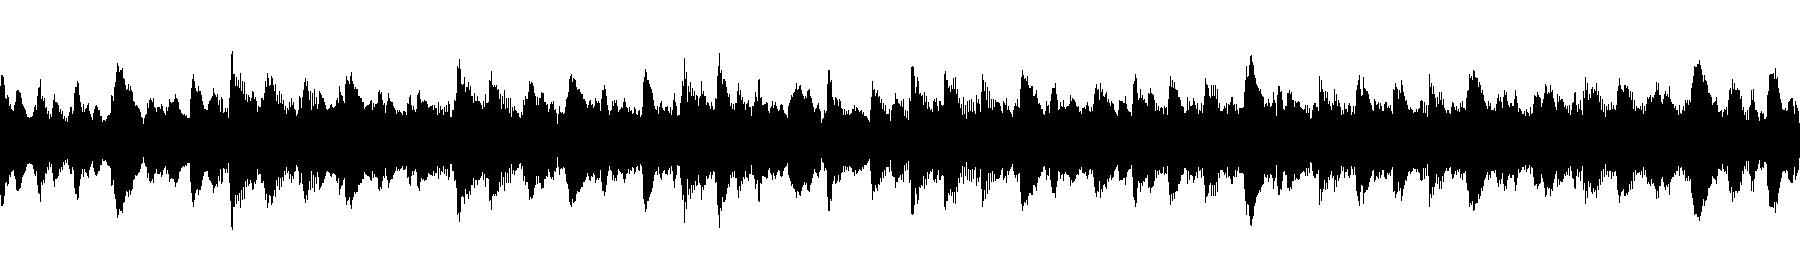 80 d pianotexture sp 02